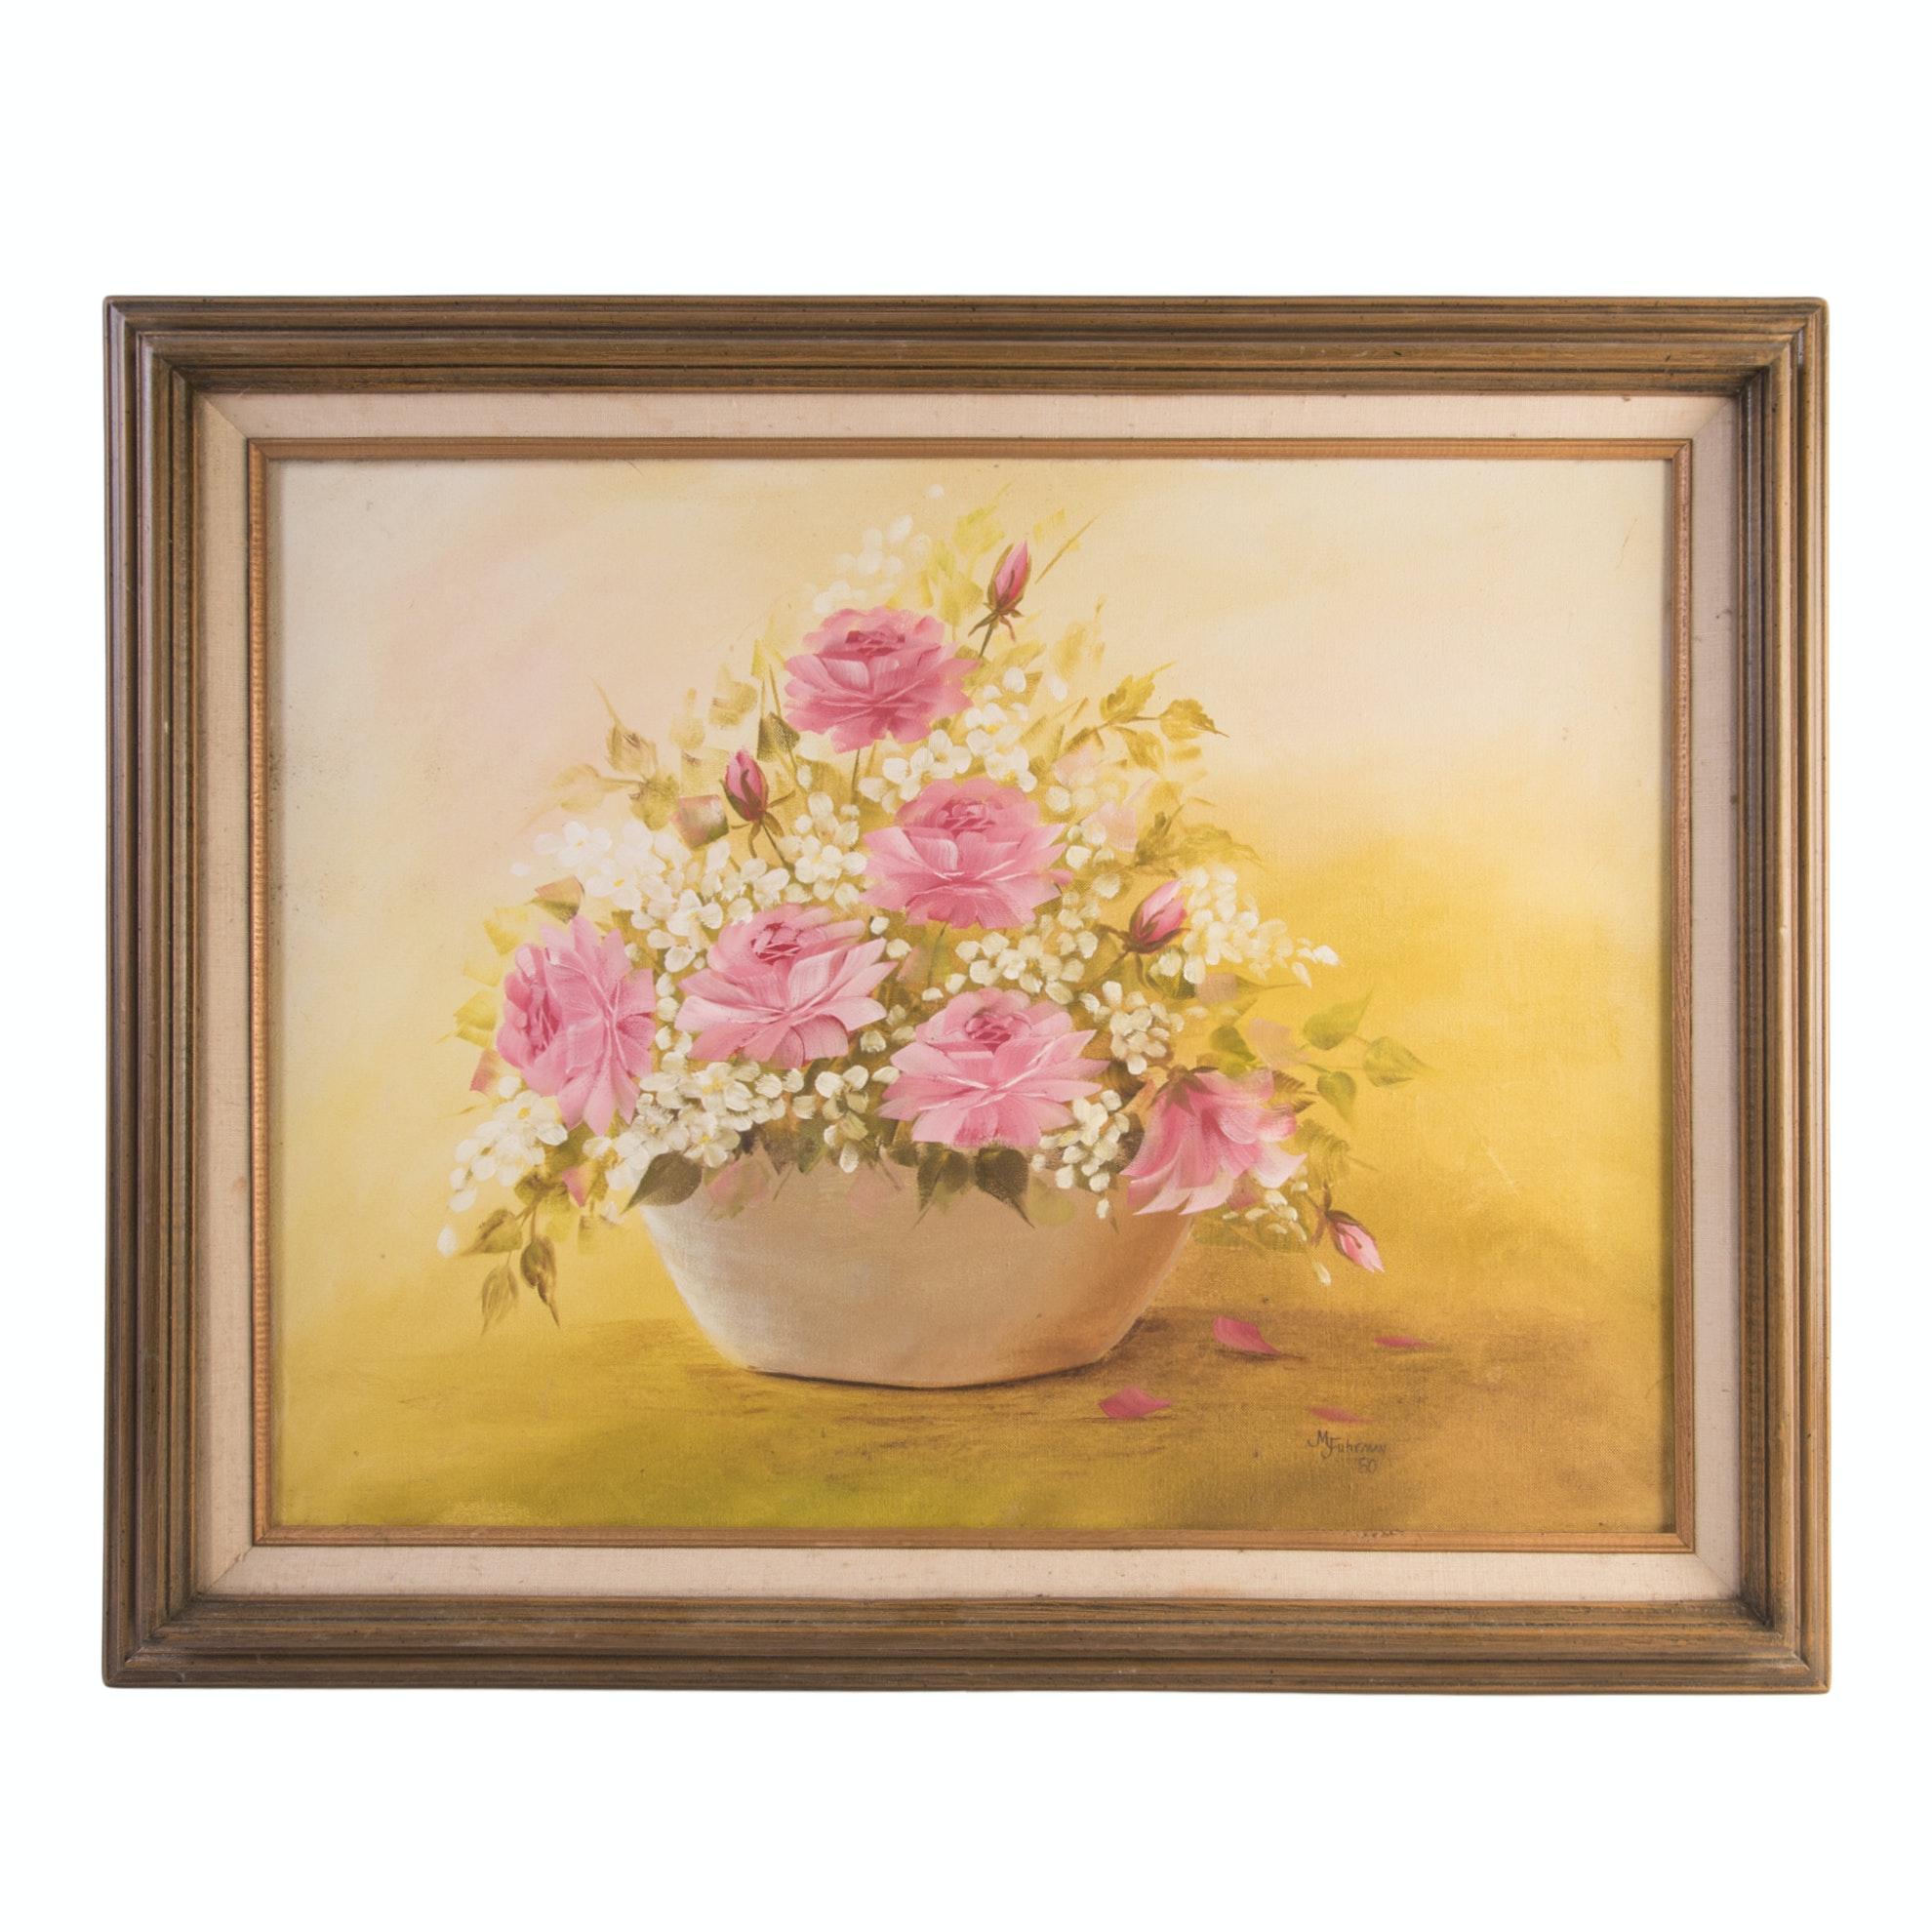 M. Fuhrman Acrylic Painting on Canvas